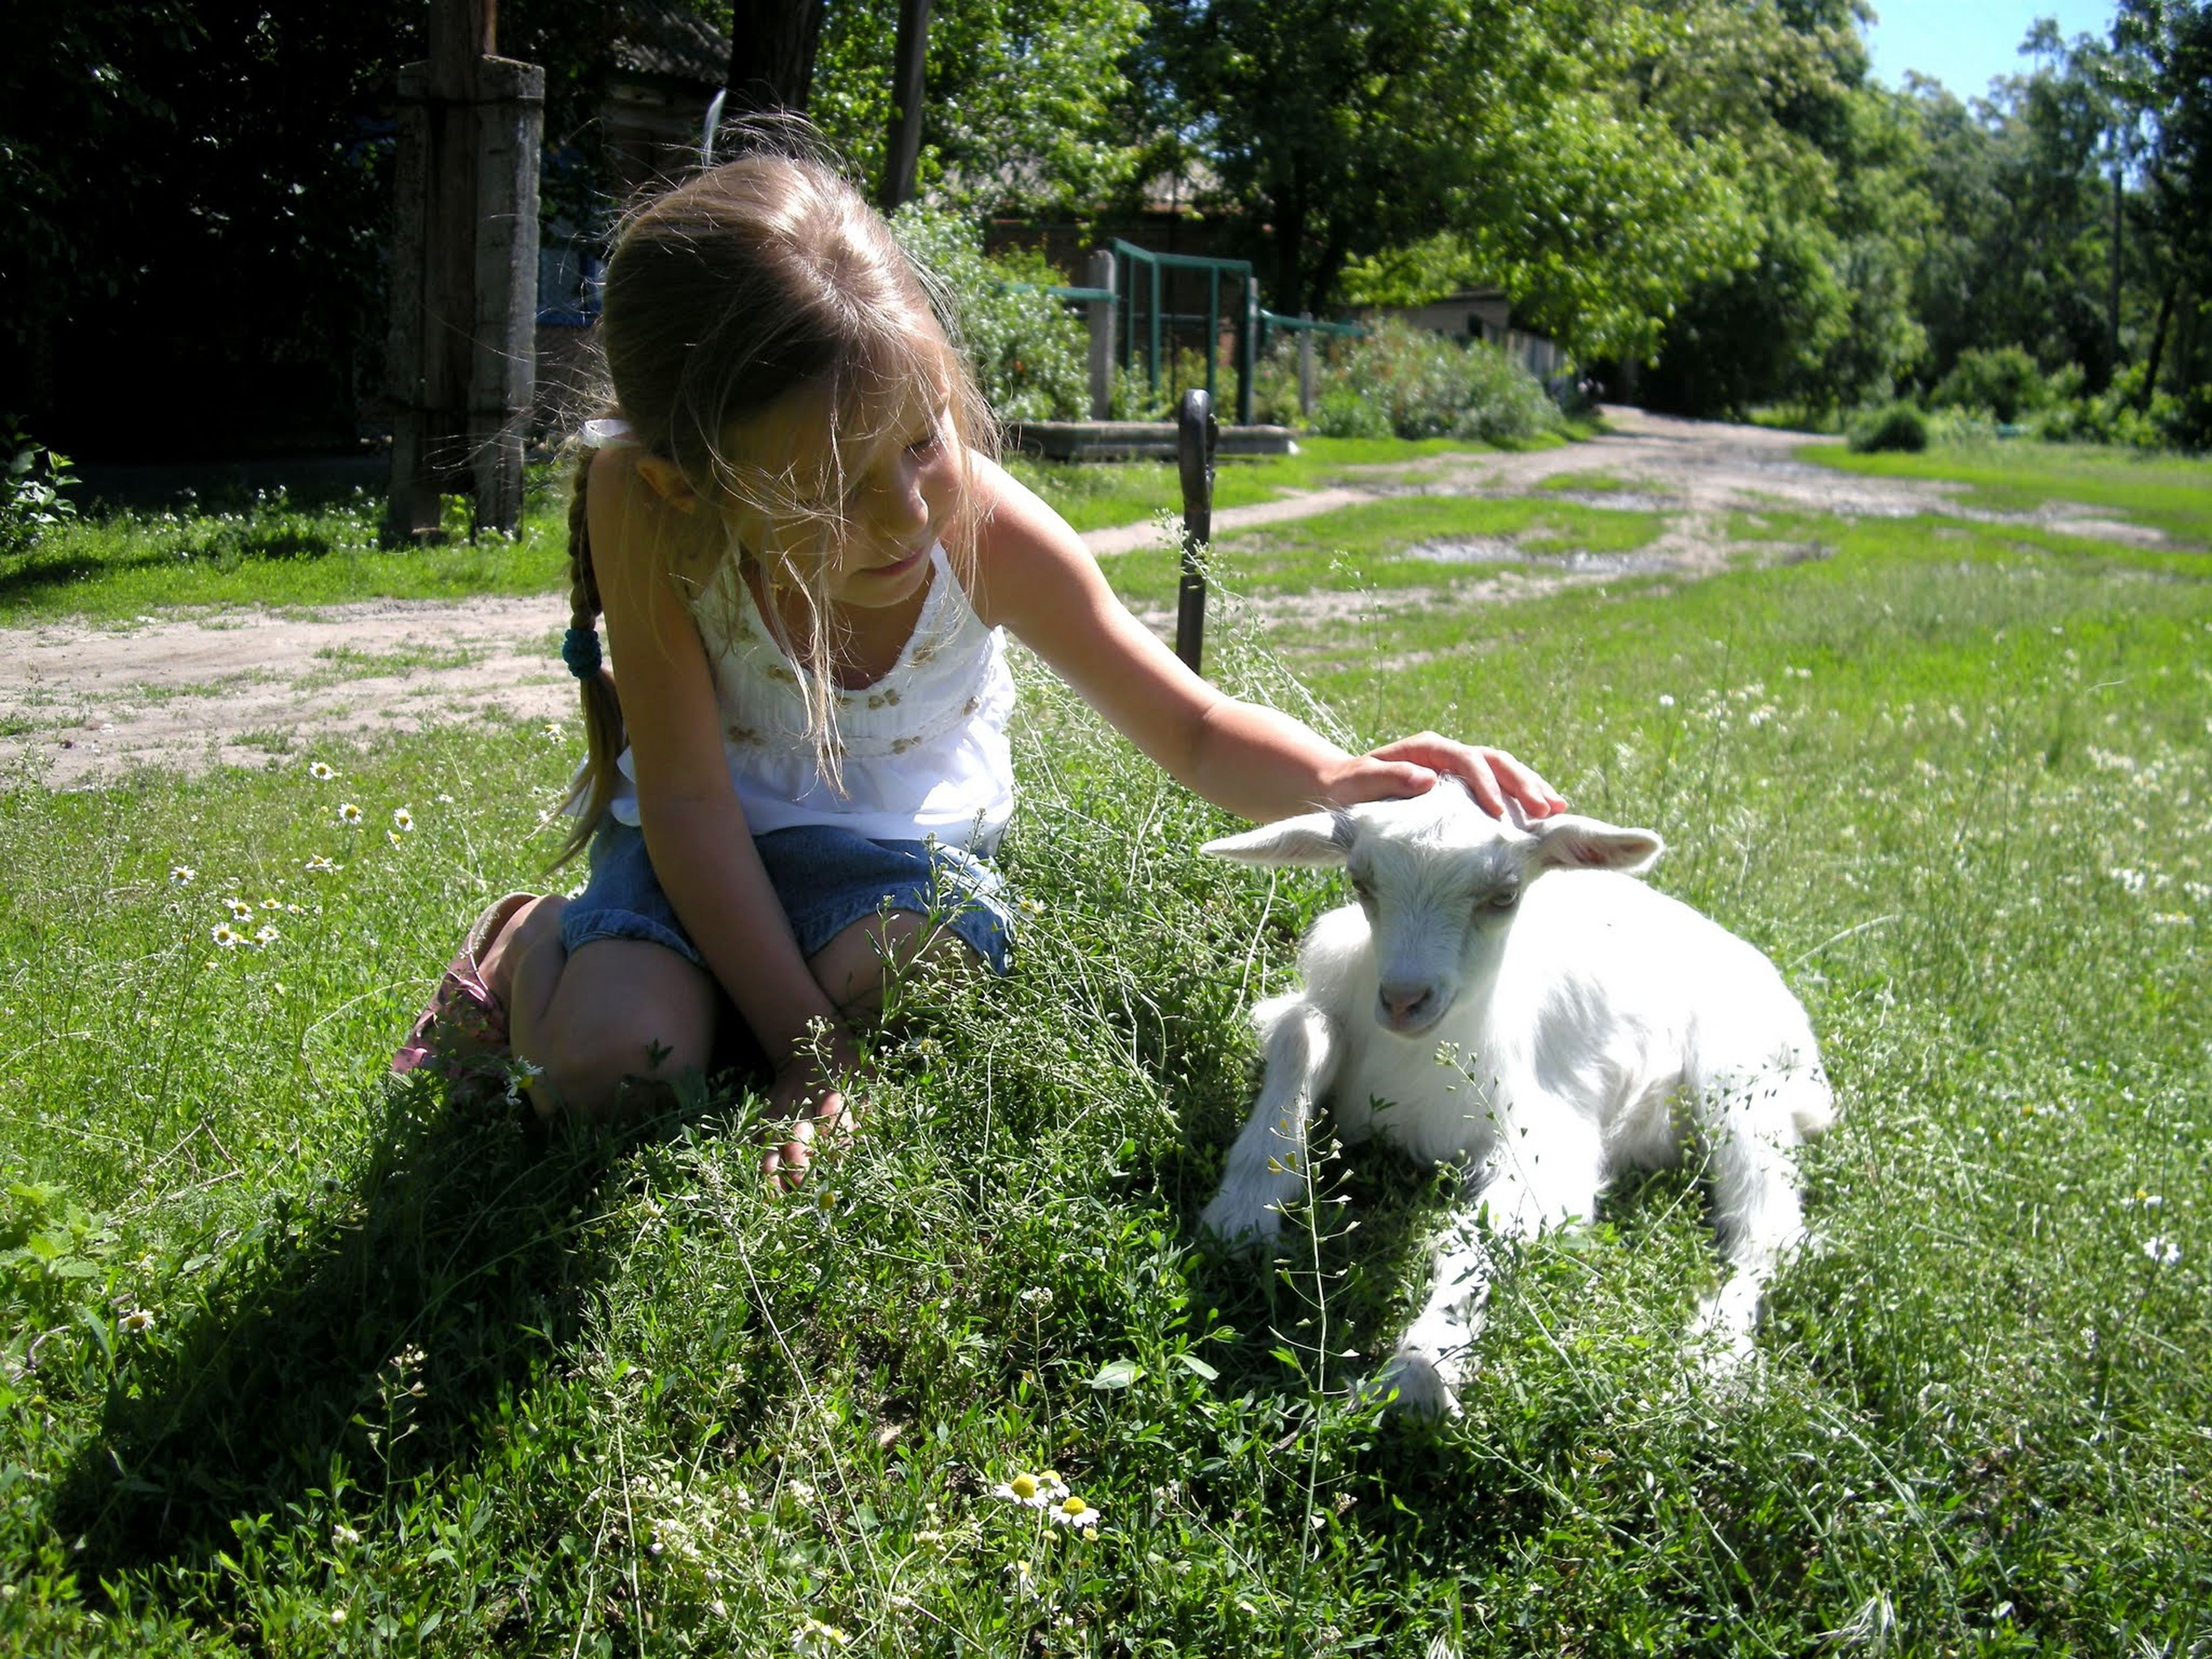 Animal Themes Child Childhood Day Nature Outdoors Козлёнок ребёнок с животным